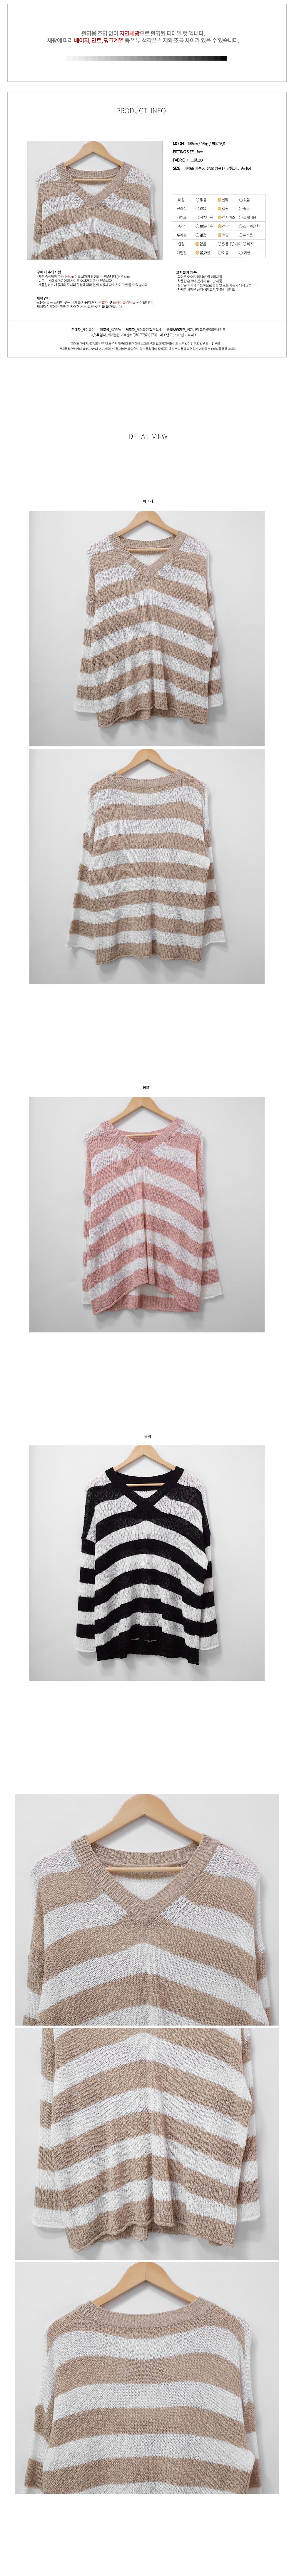 Chino Stripe V-Neck Loose-fit Knitwear